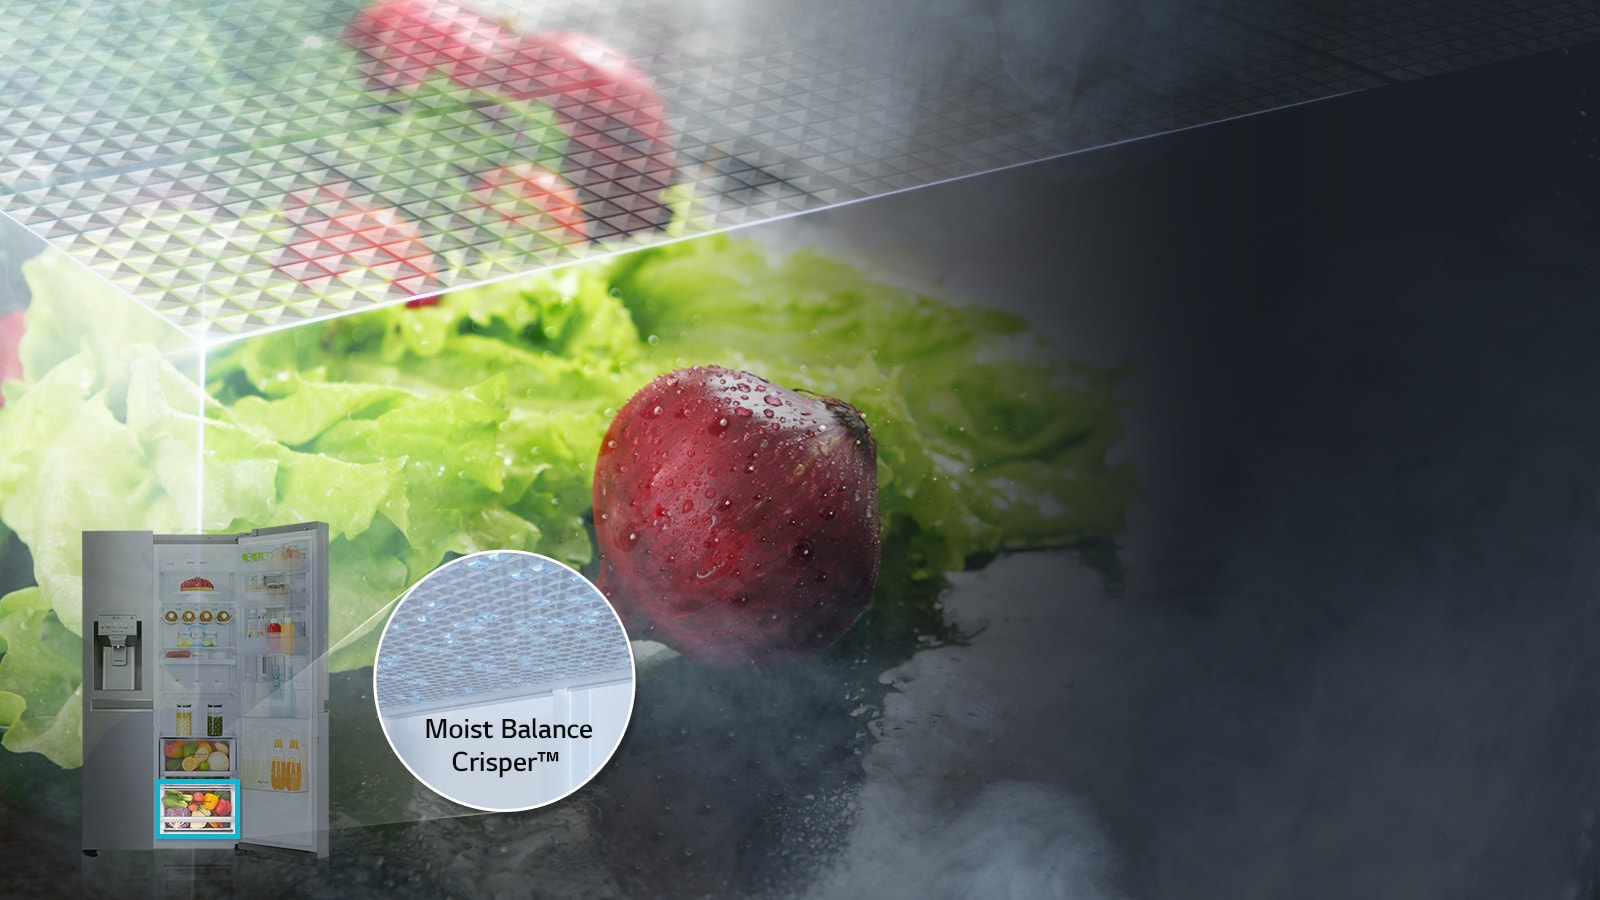 Moist Balance Crisper™ ตู้เย็น